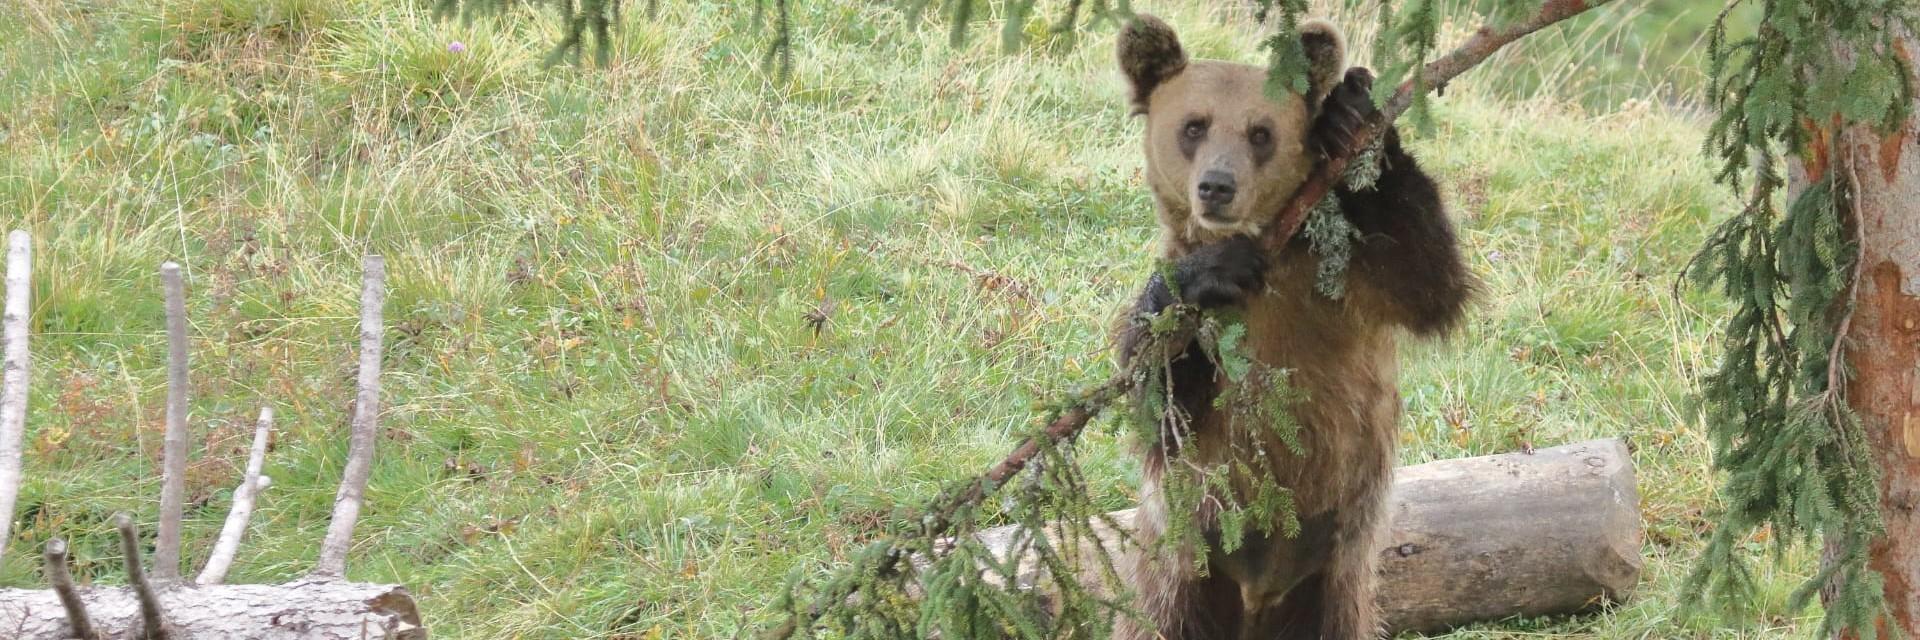 Bear Amelia in Arosa